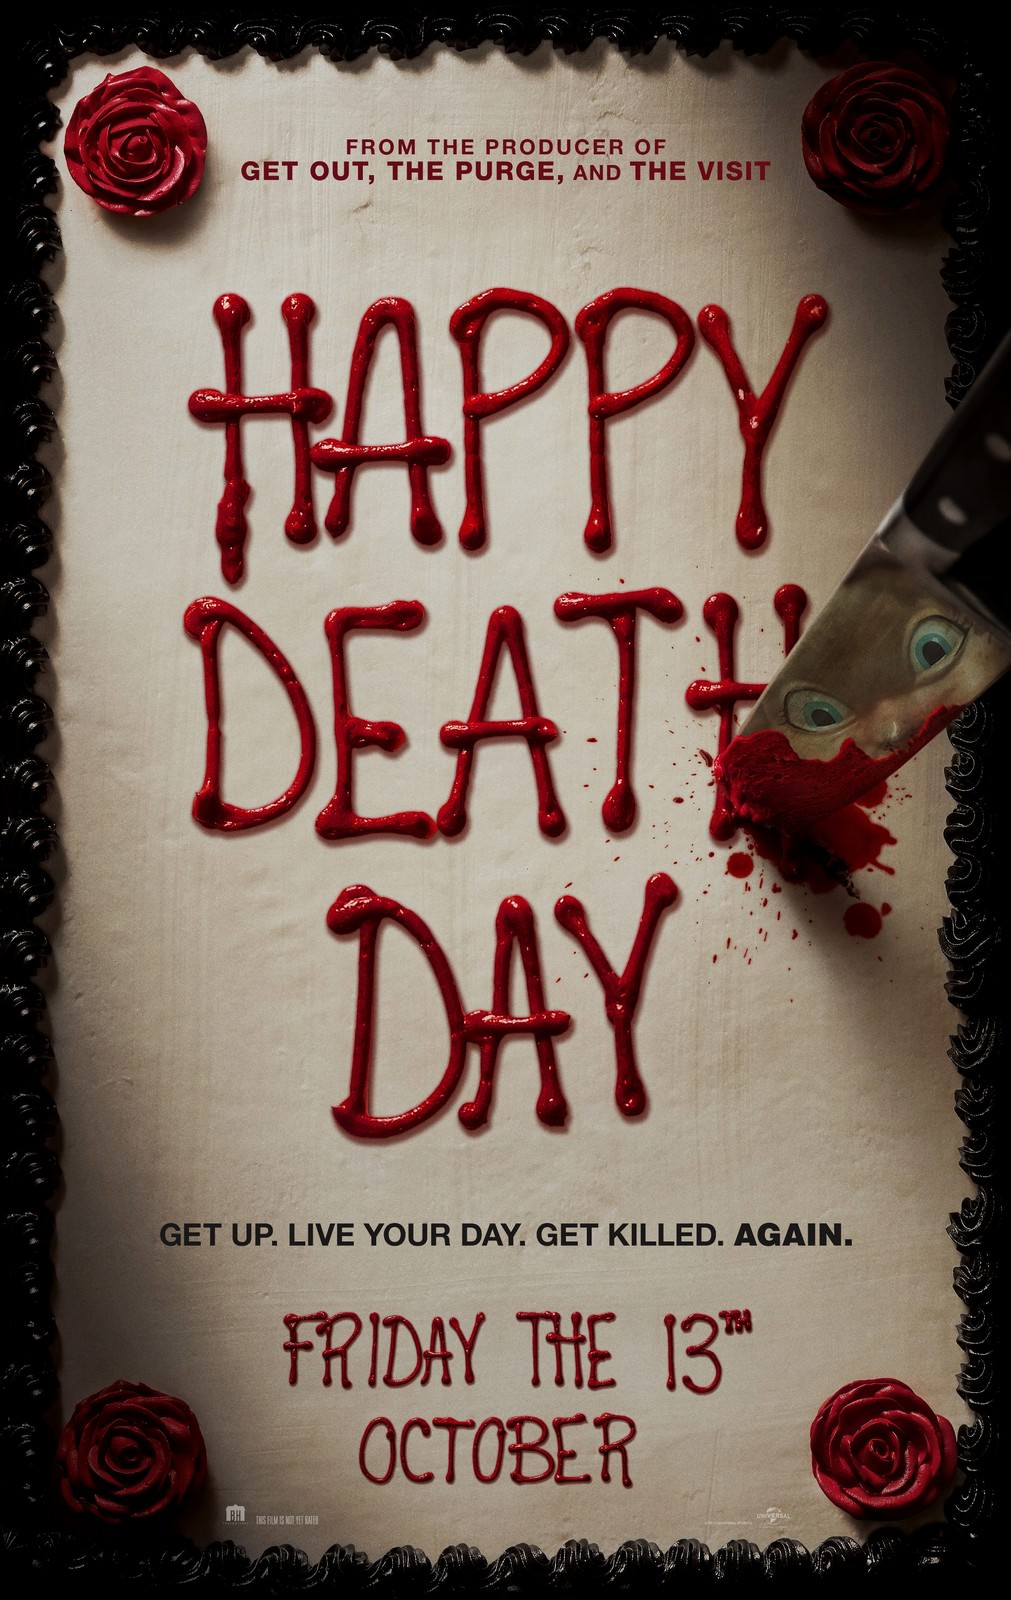 Movie, Happy Death Day(美國, 2017年) / 忌日快樂(台灣) / 忌日快乐(中國) / 死亡無限LOOP(香港), 電影海報, 美國